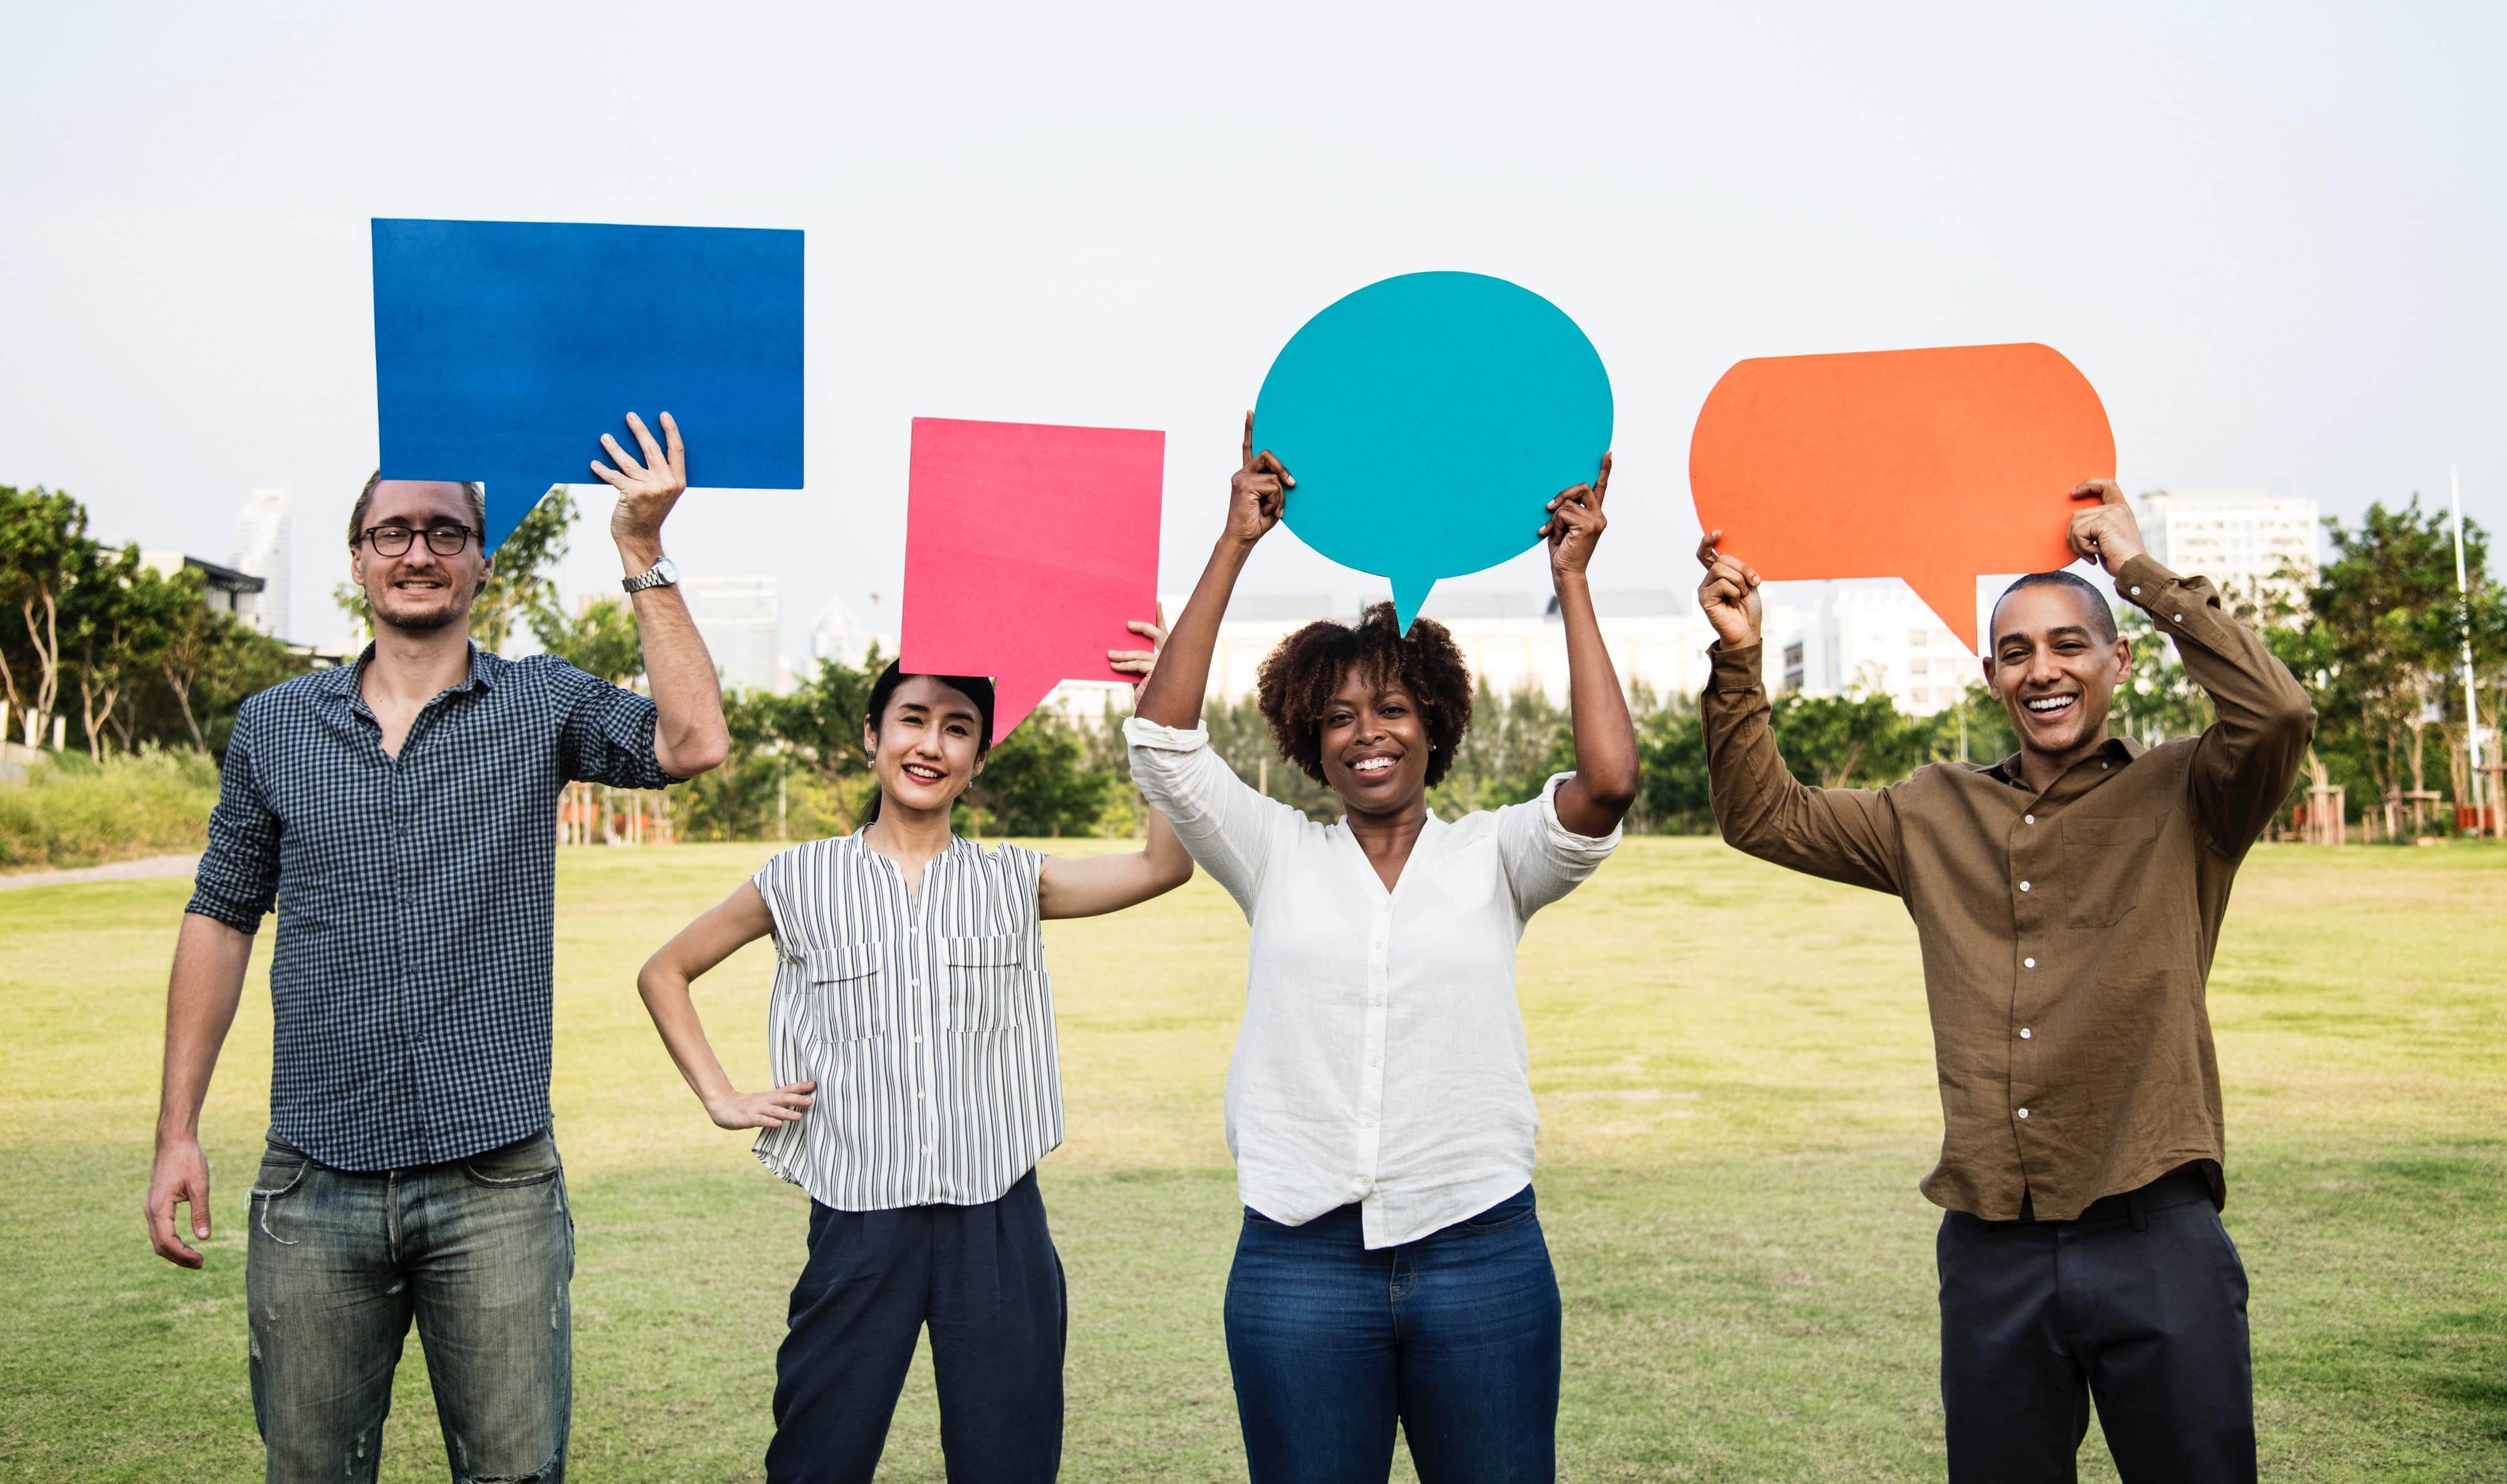 social media marketing methods to promote brands